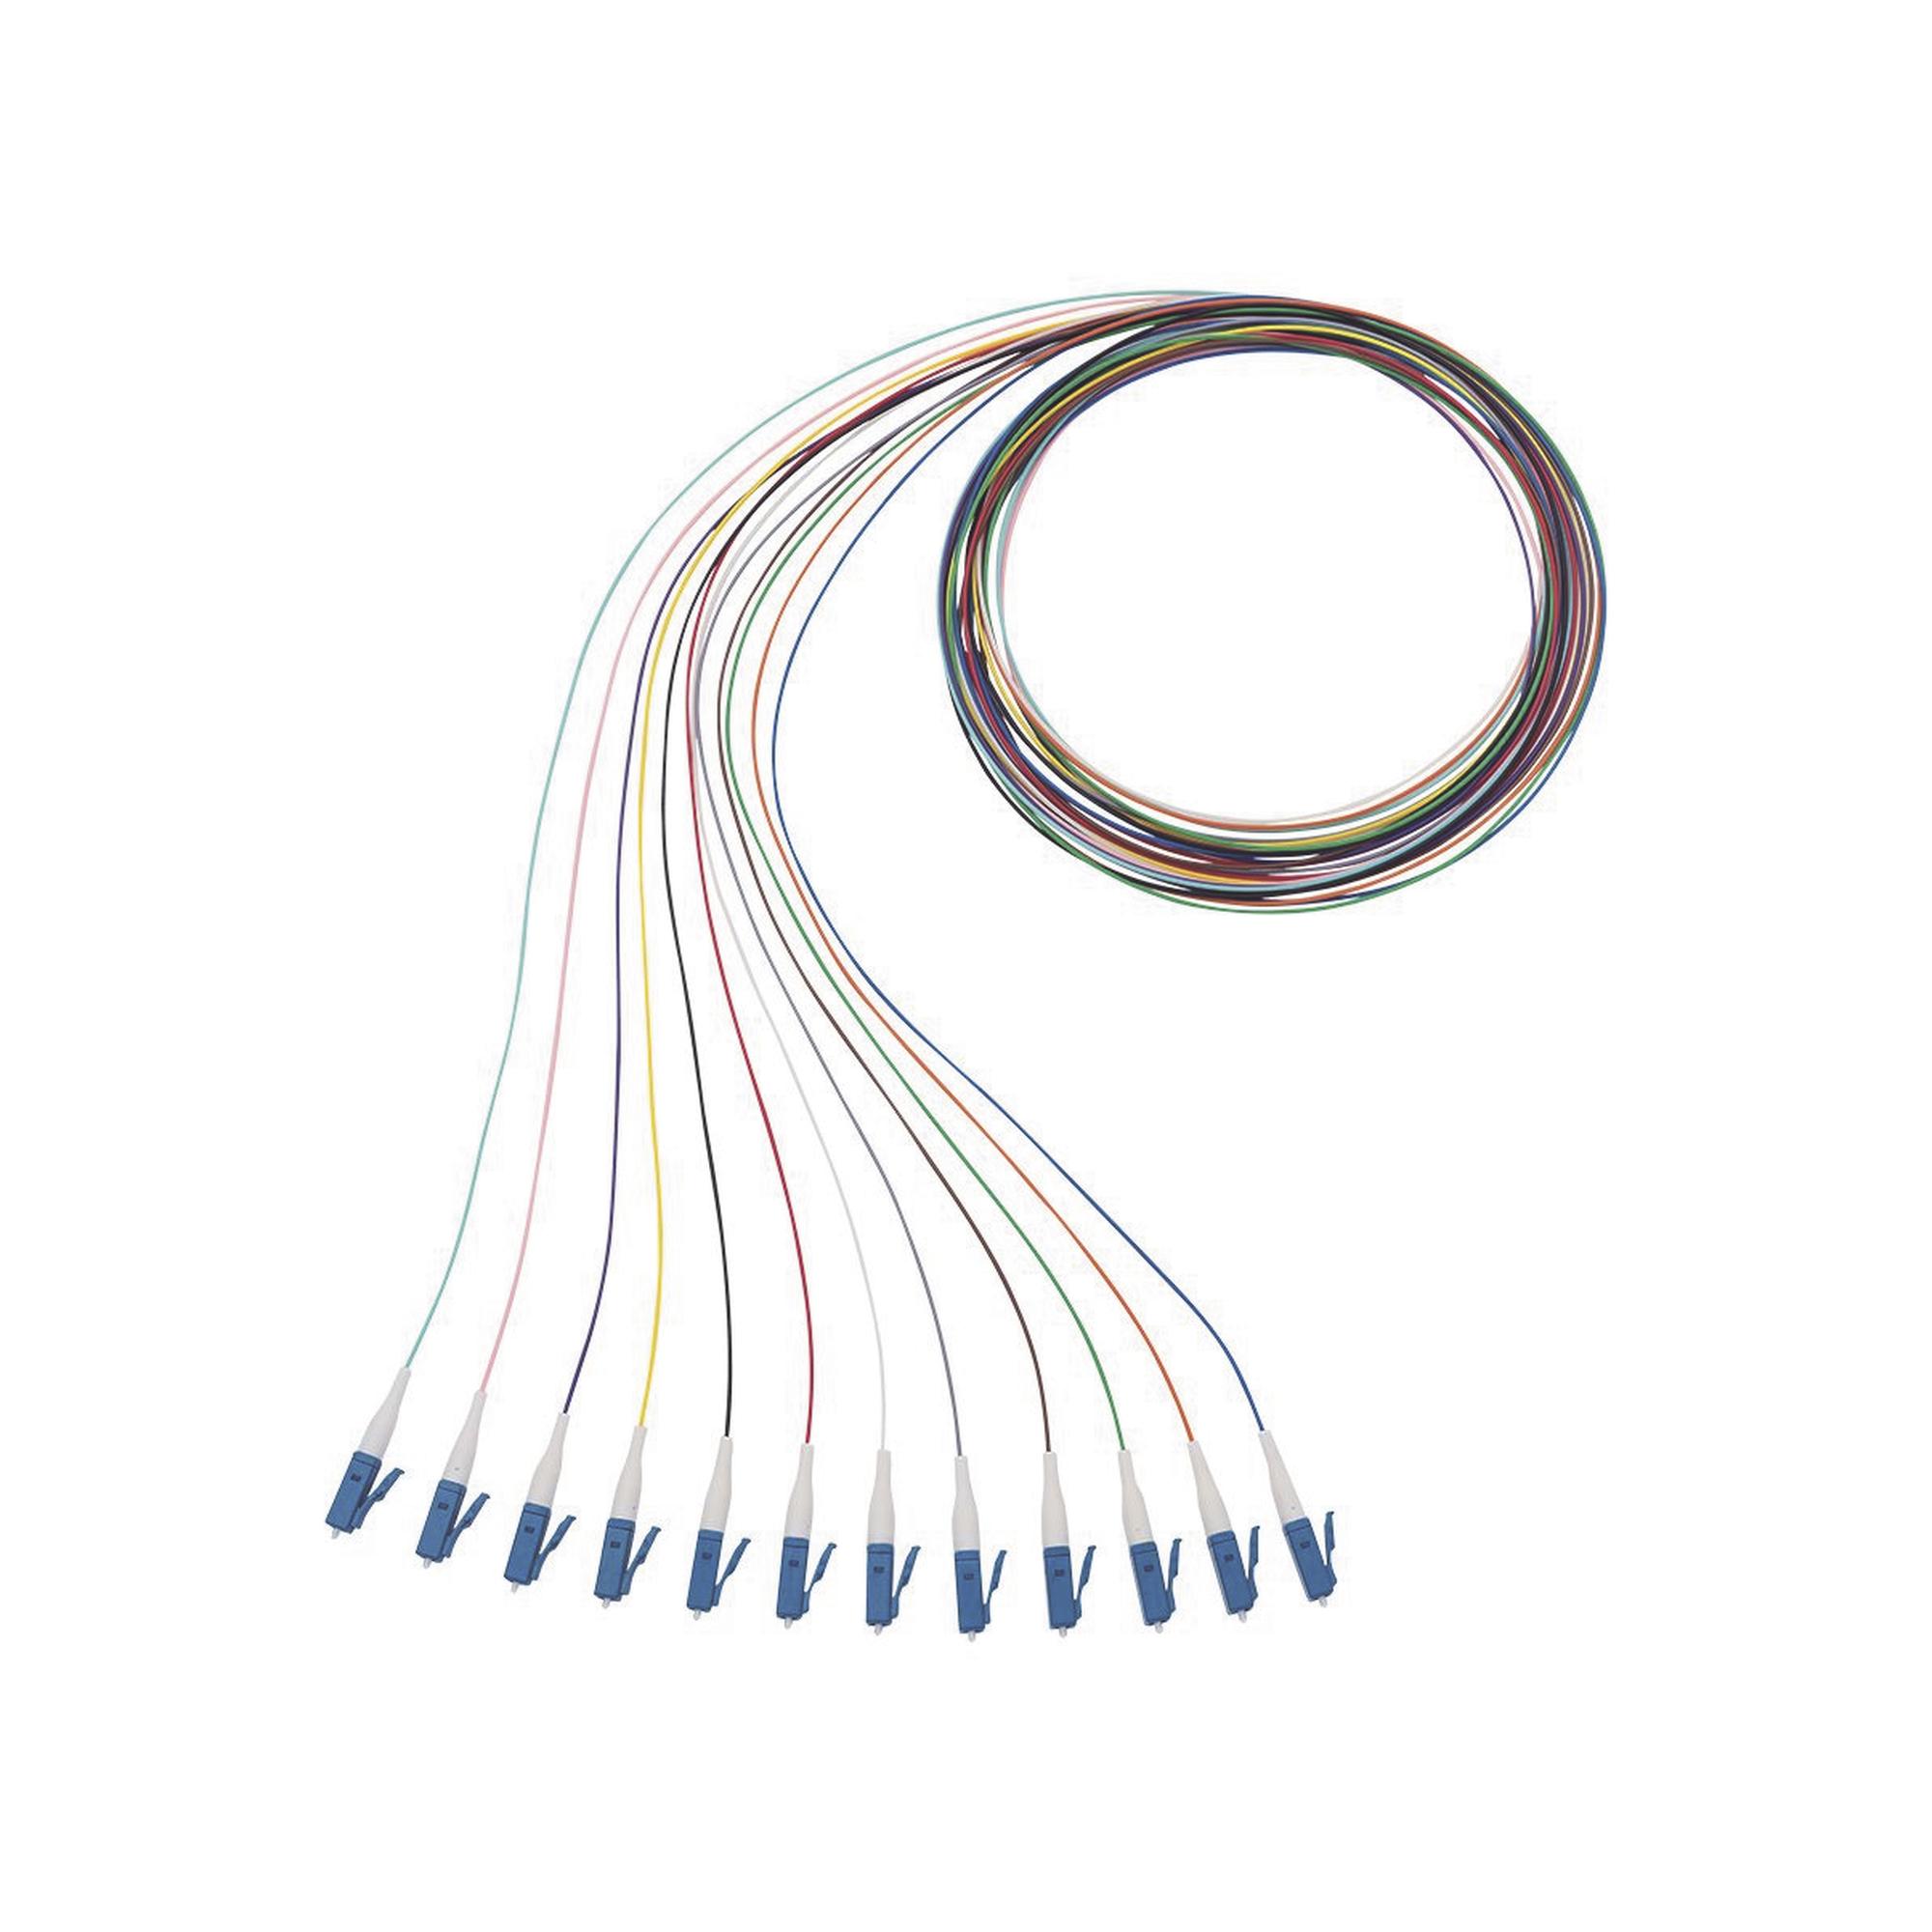 Kit de 12 Pigtails con Conector LC, Monomodo 9/125 OS2, 900um, de 1 Metro